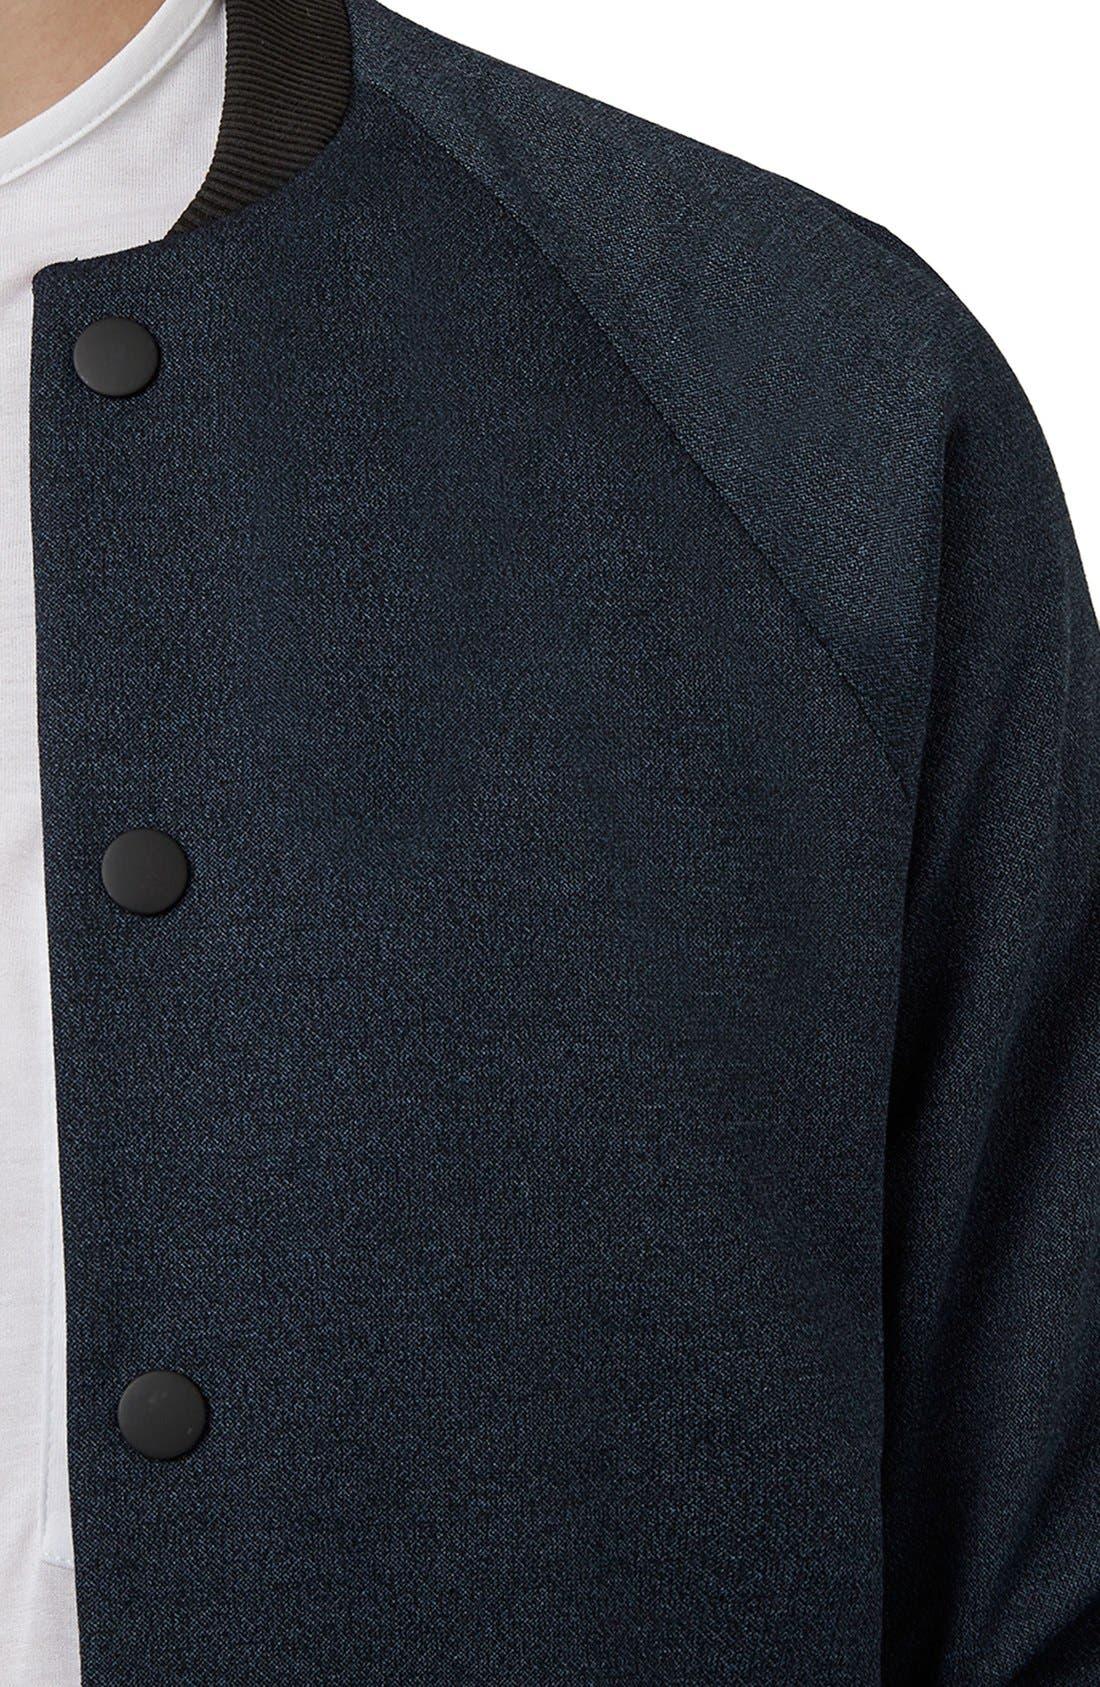 TOPMAN,                             Tailored Fit Raglan Bomber Jacket,                             Alternate thumbnail 2, color,                             410